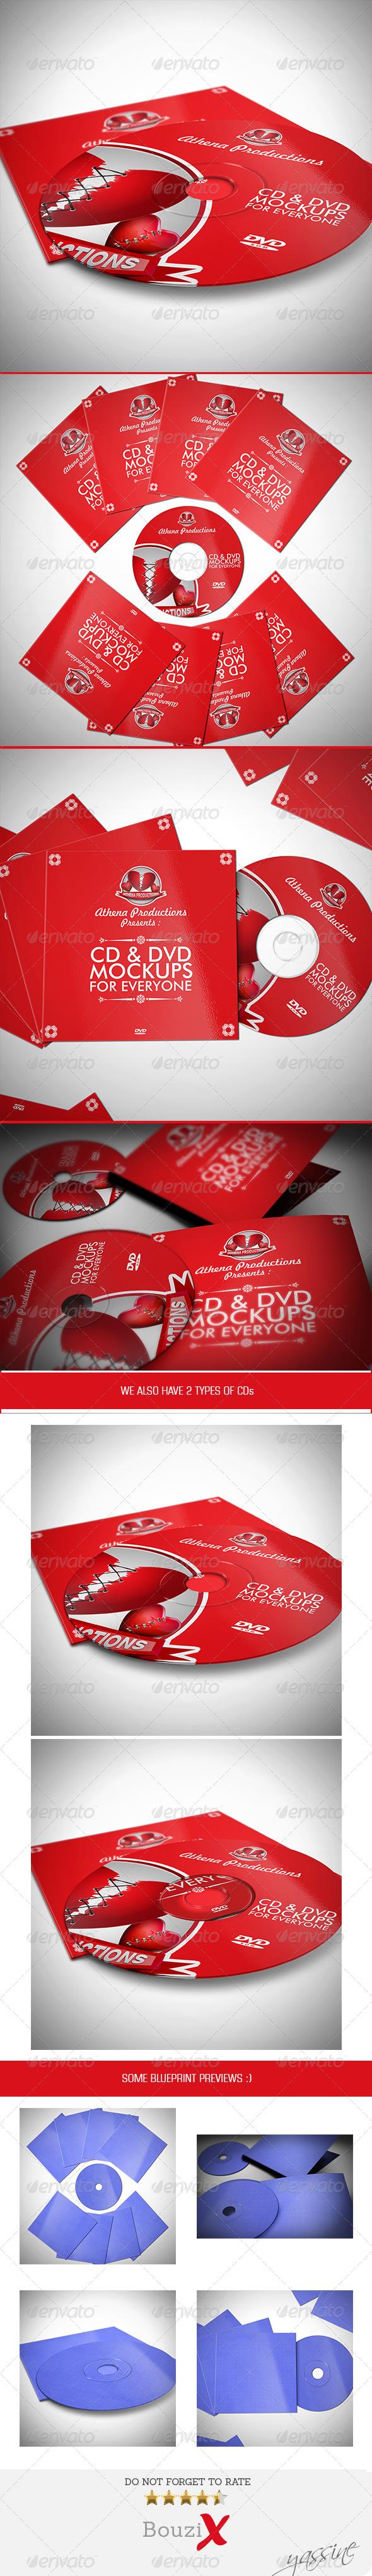 GraphicRiver CD Sleeve & Sticker Mockups 7654072